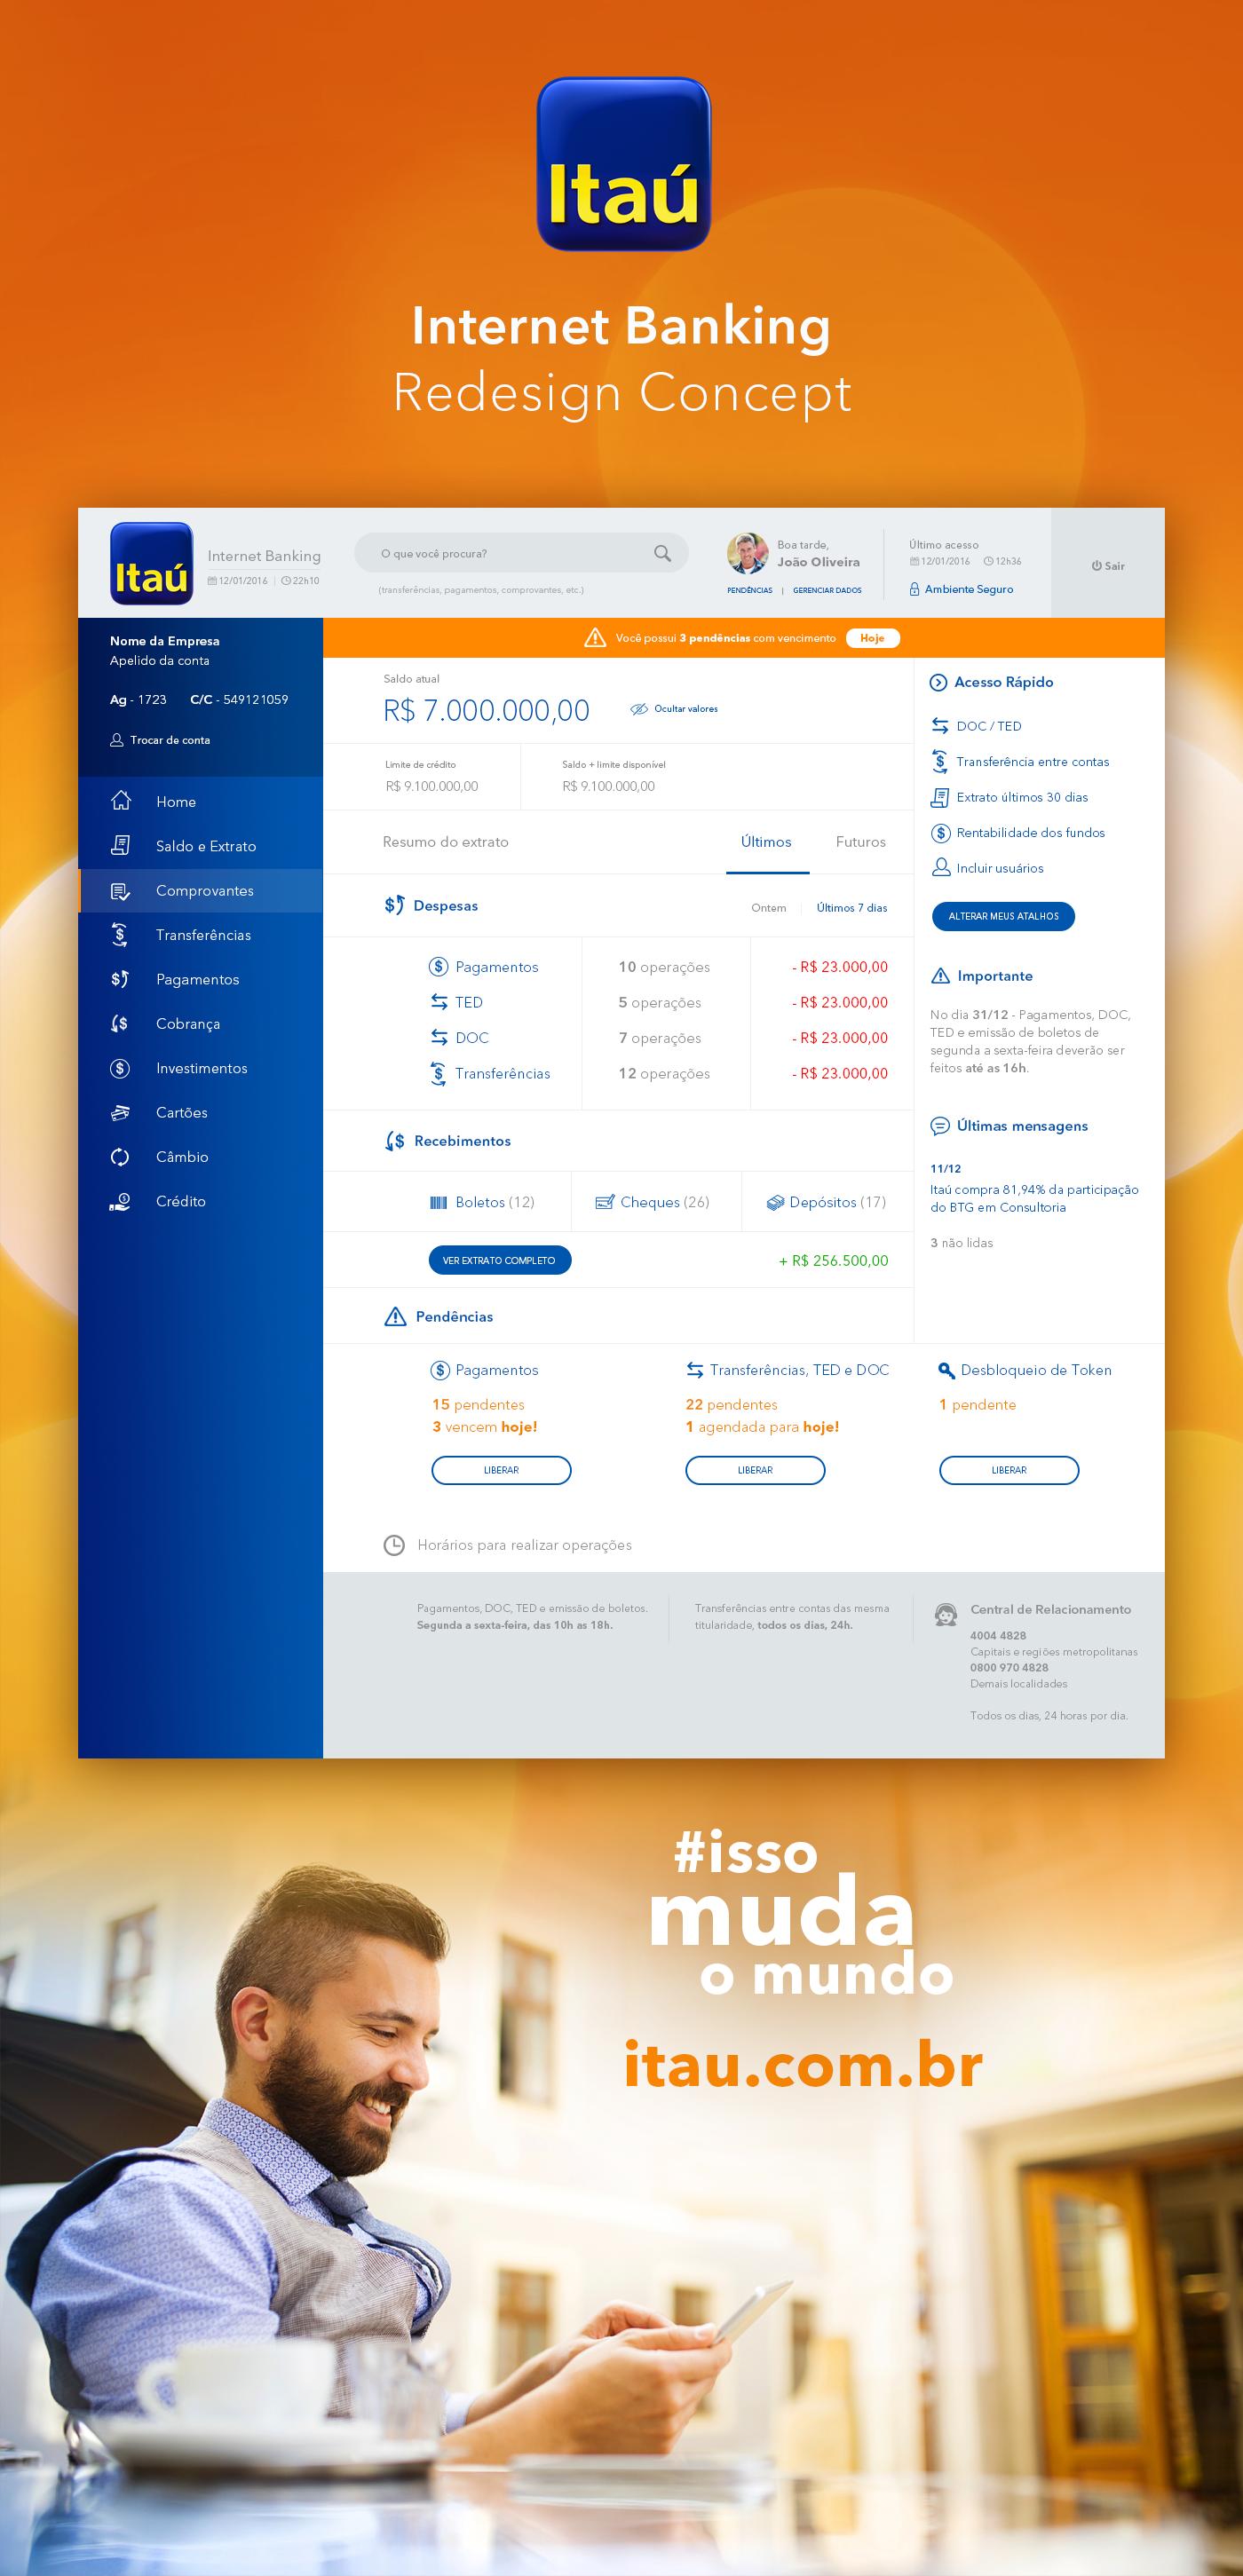 Itaú - Internet Banking on Behance